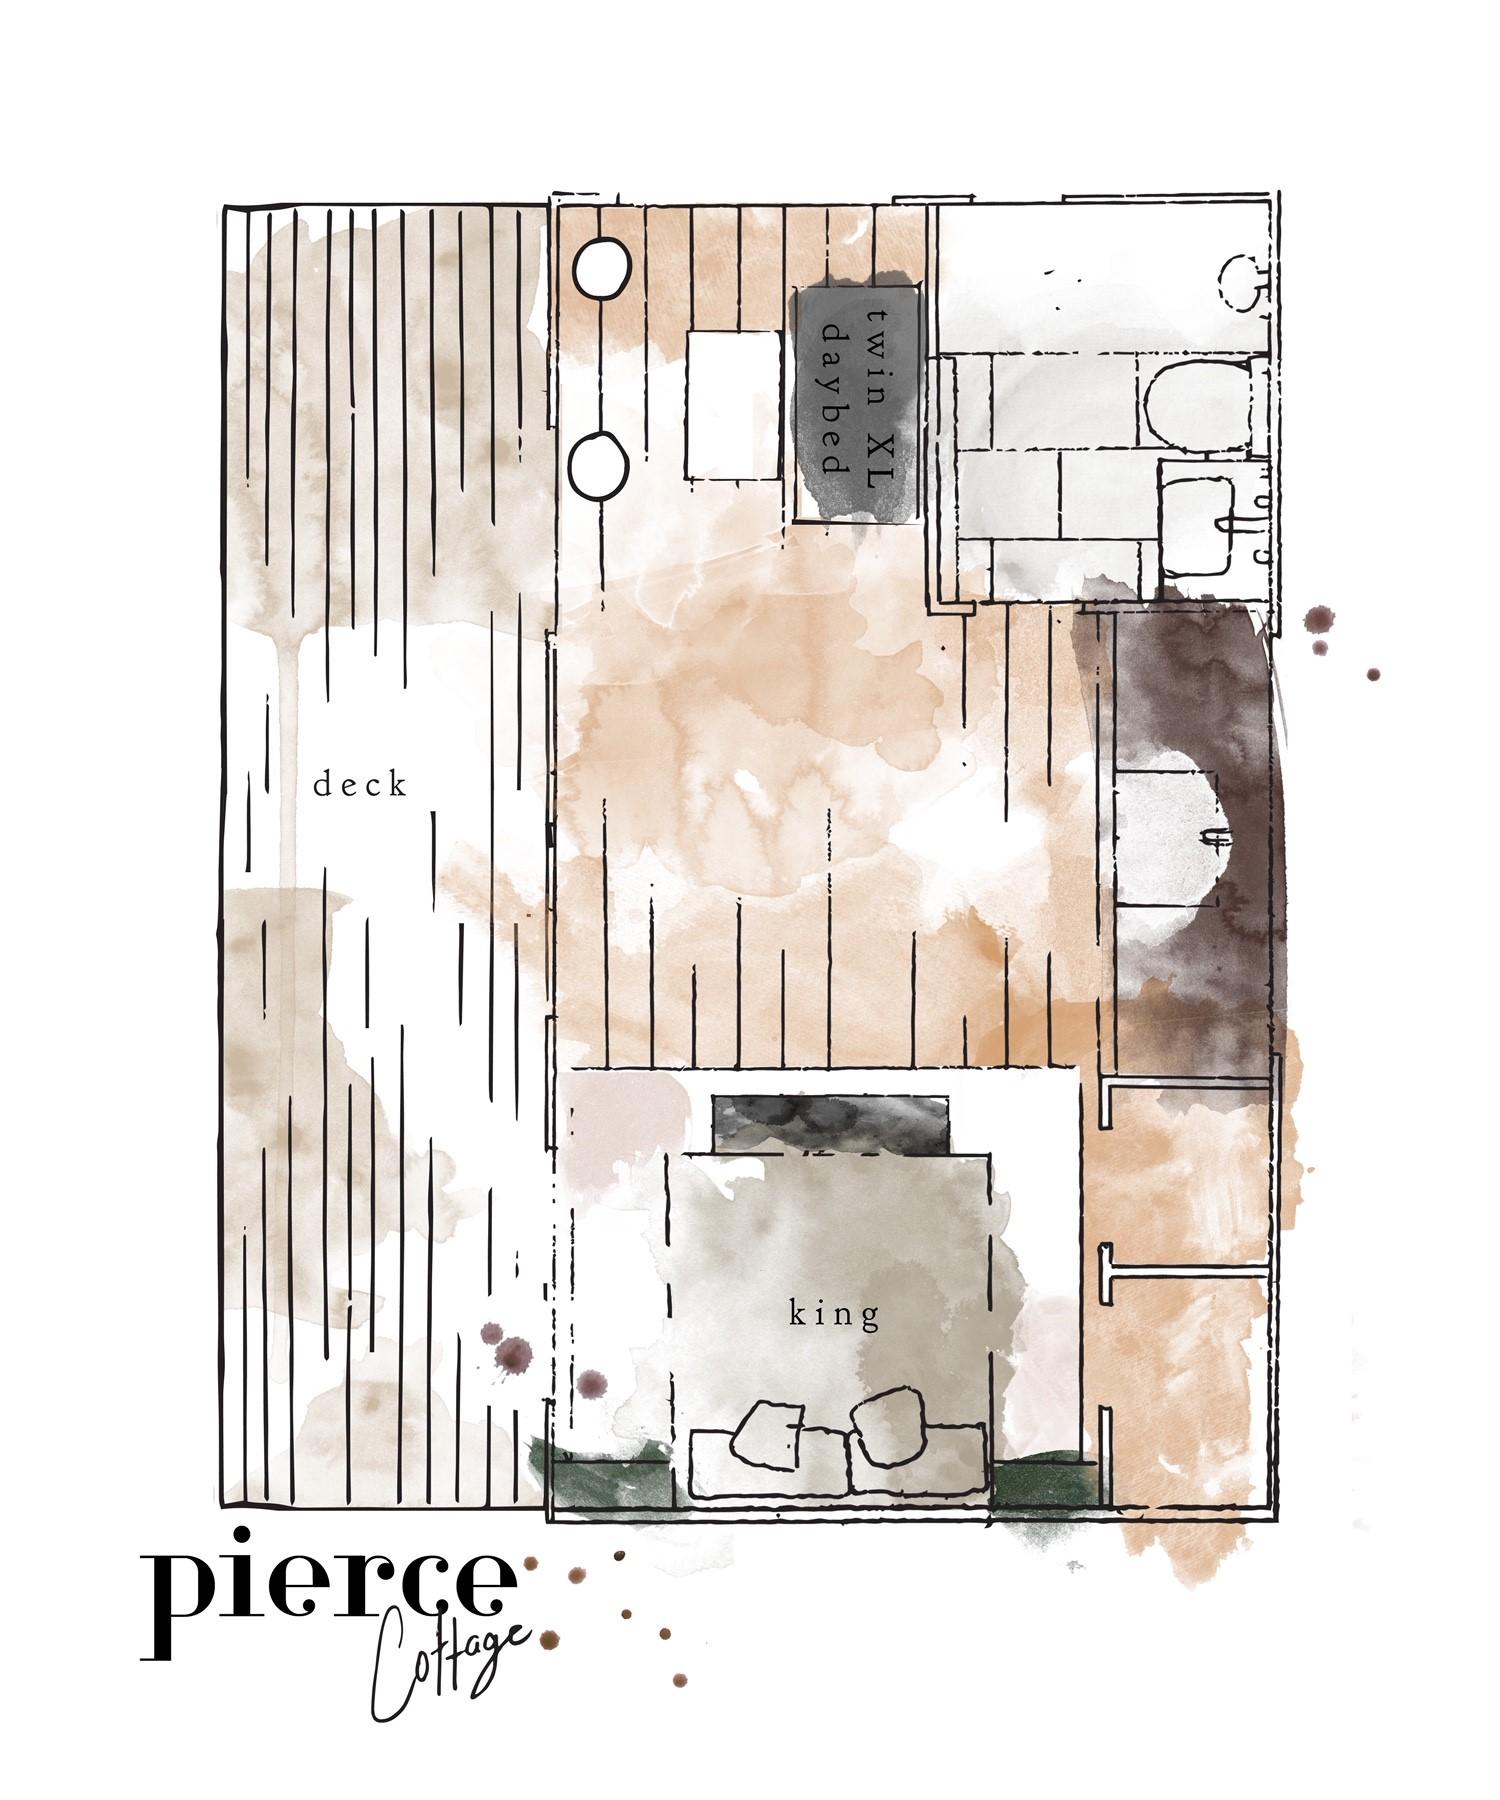 The Pierce LayoutFINAL.jpg